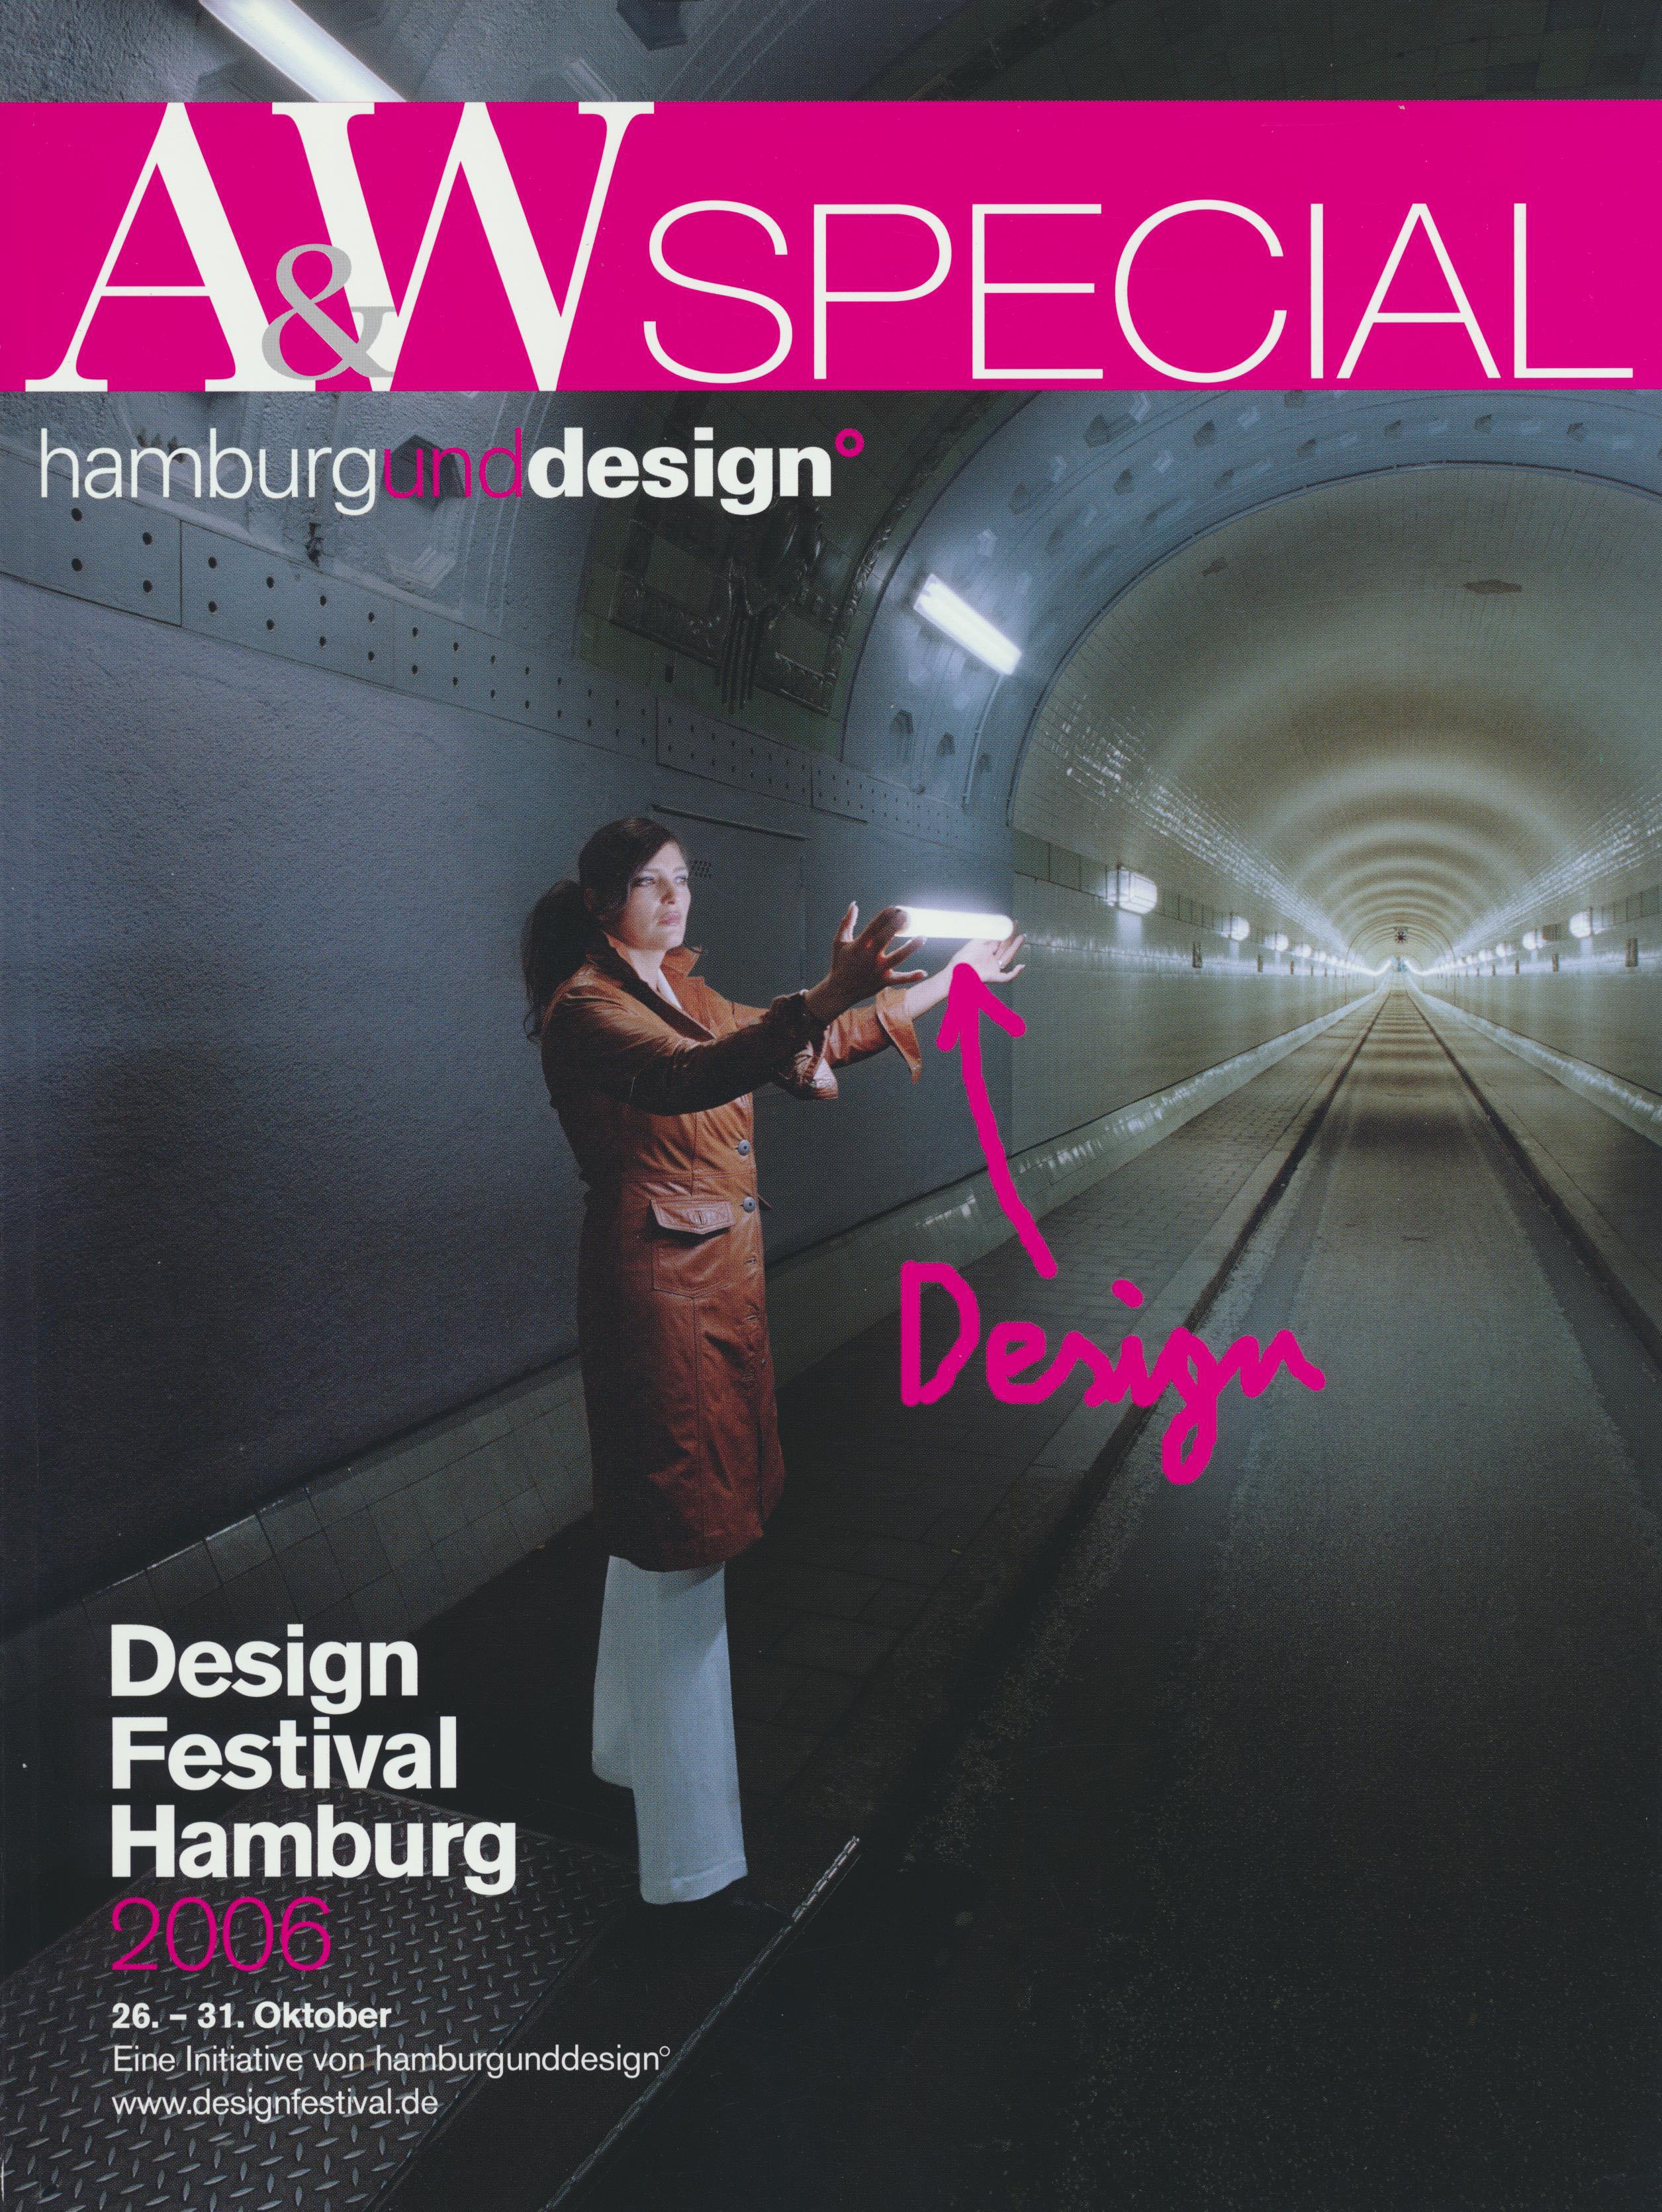 AW_hamburgdesign 001.jpg